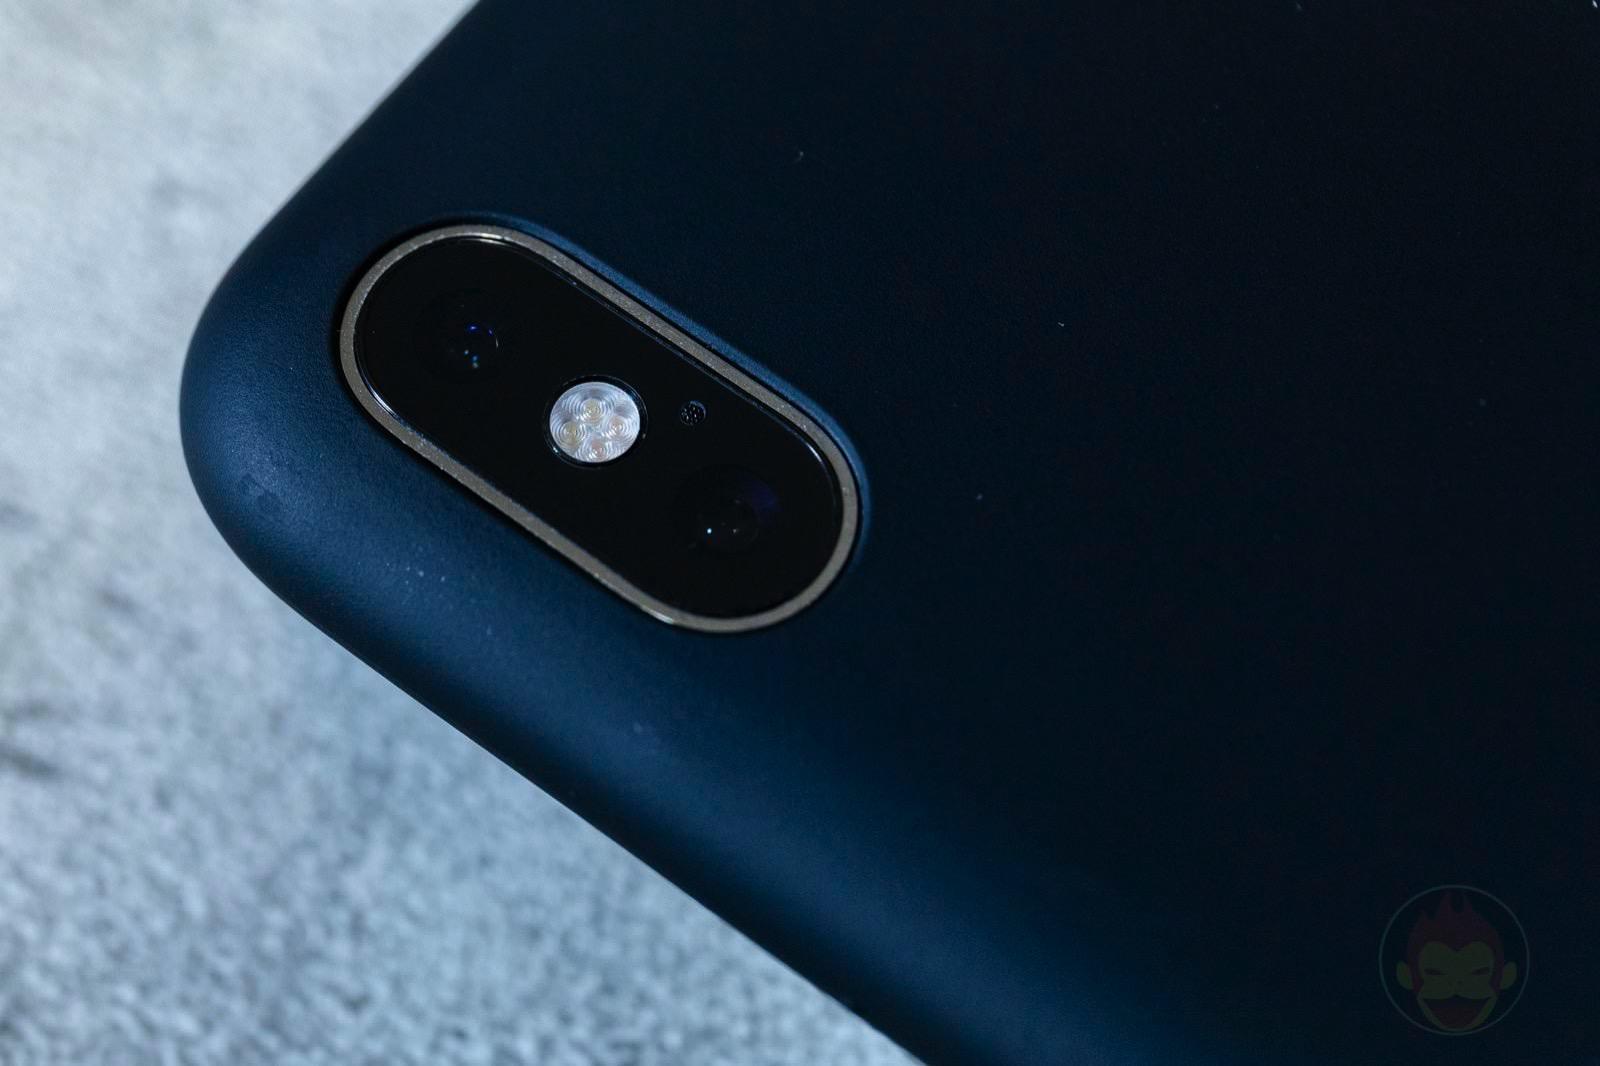 MYNUS-iPhone-XS-Case-Review-04.jpg